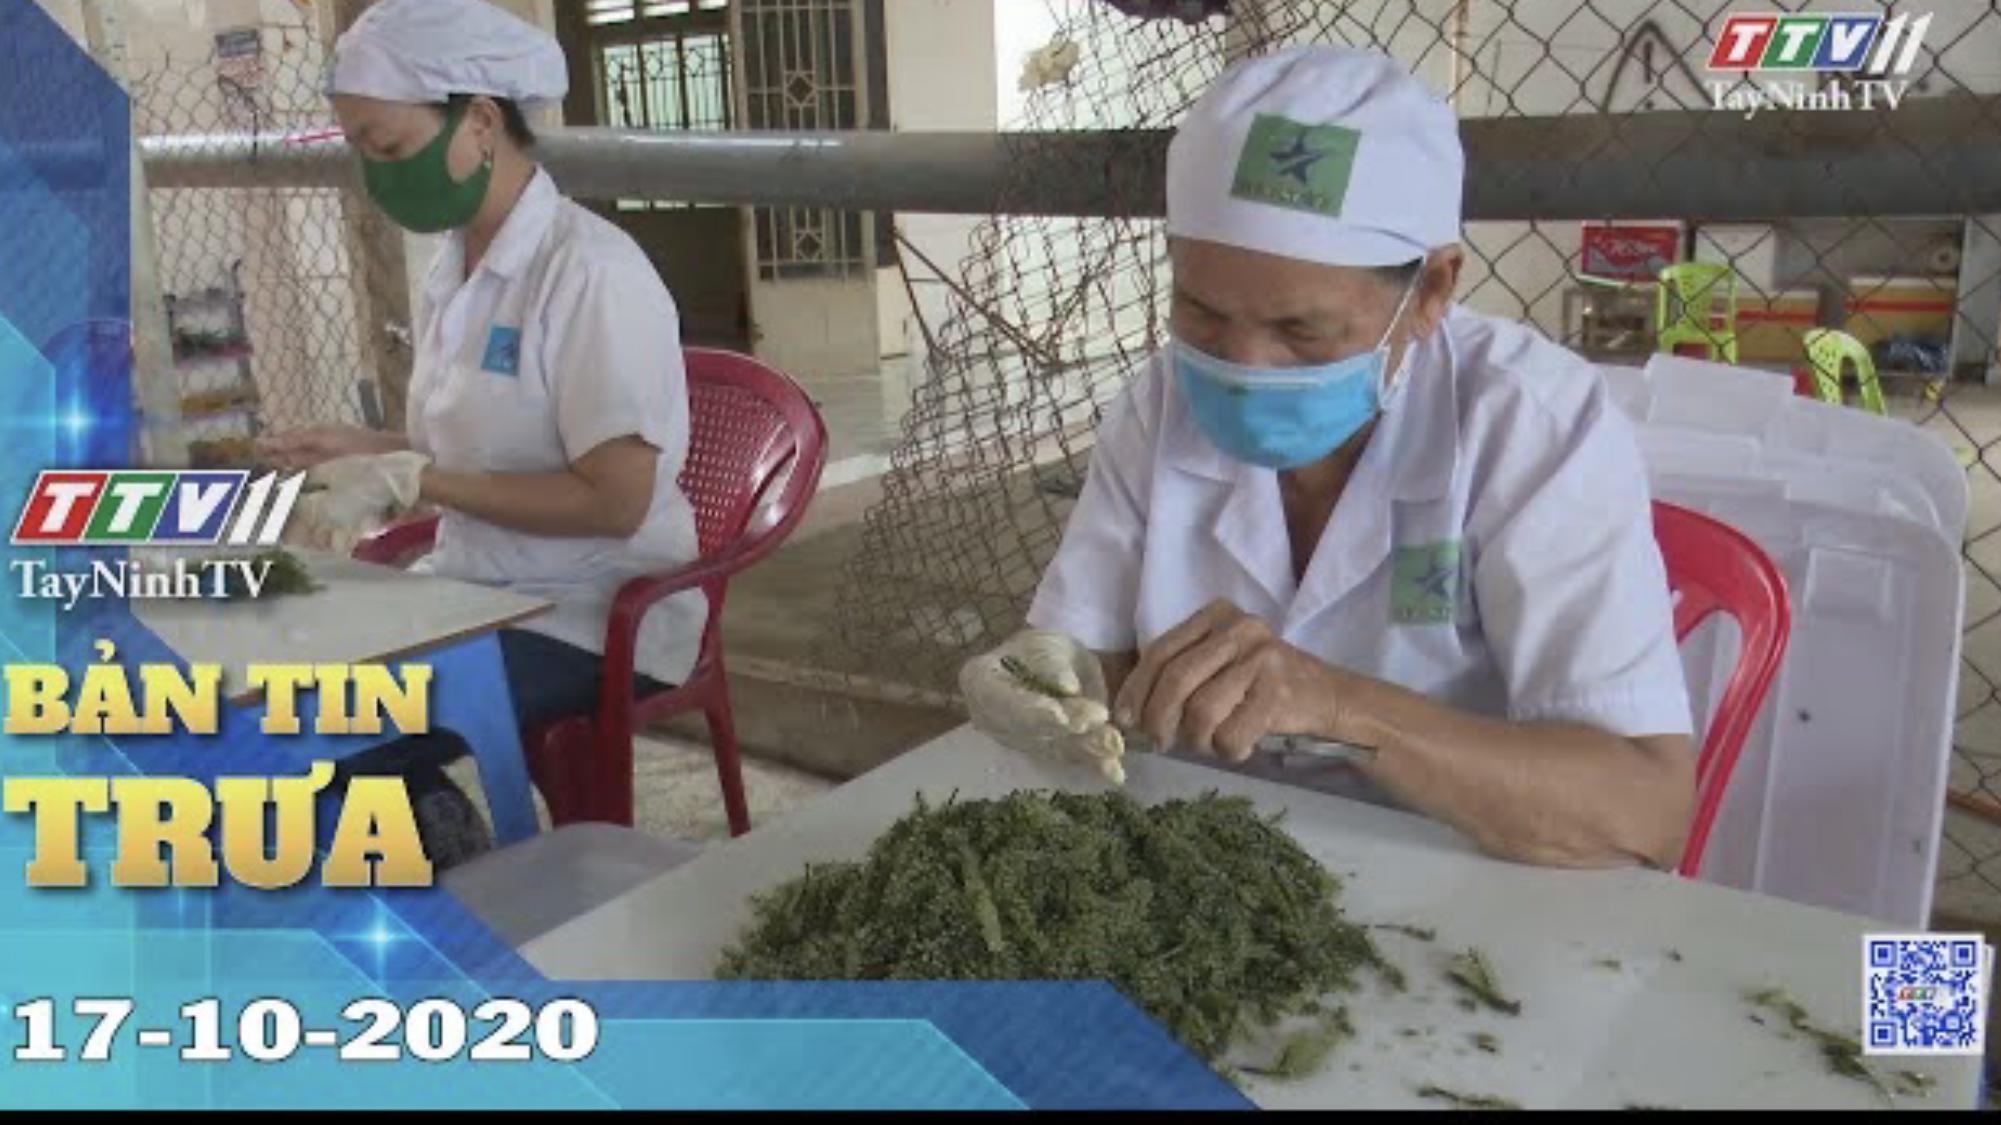 Bản tin trưa 17-10-2020 | Tin tức hôm nay | TayNinhTV